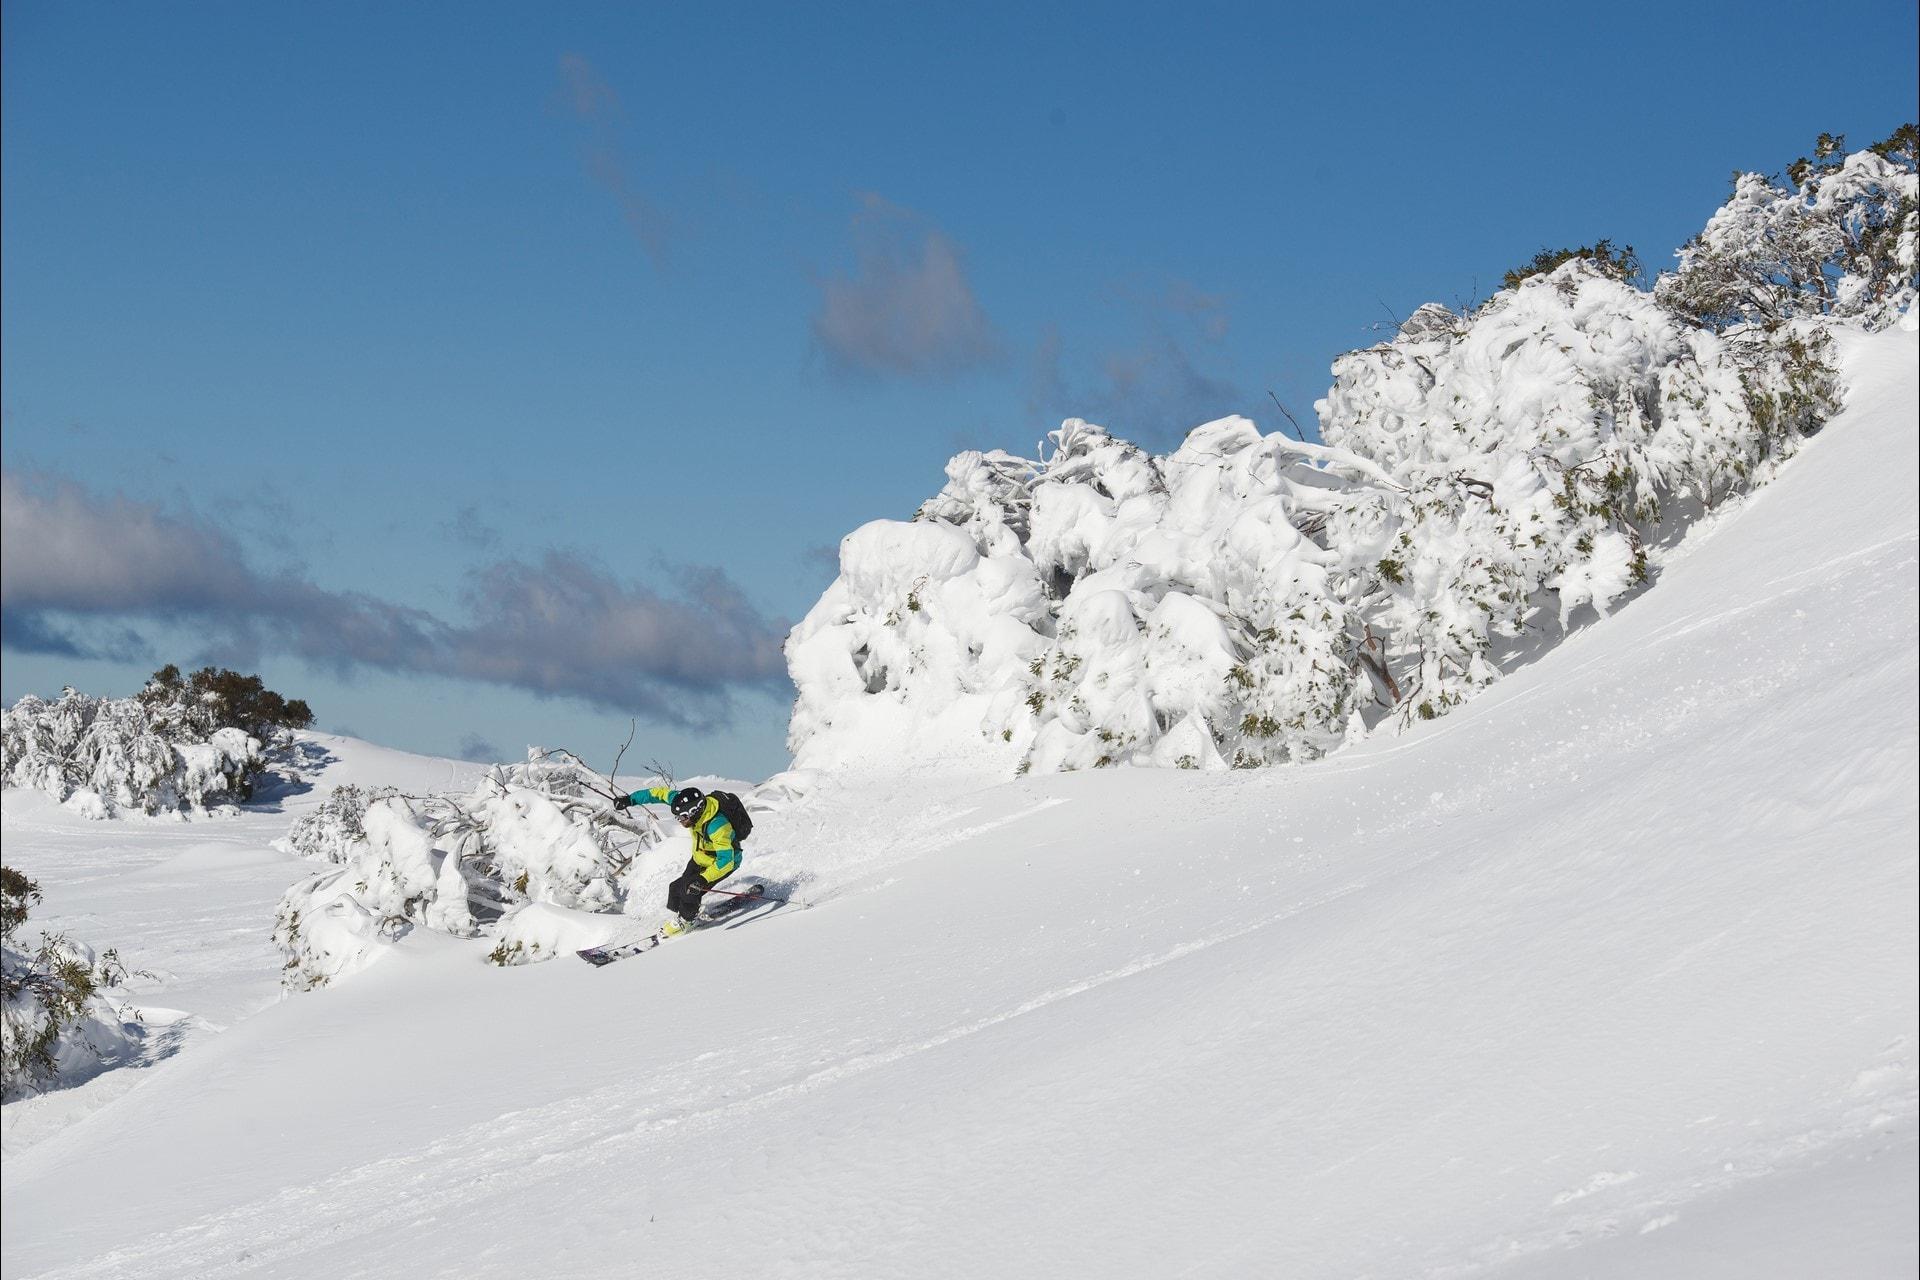 Ski falls creek schools groups